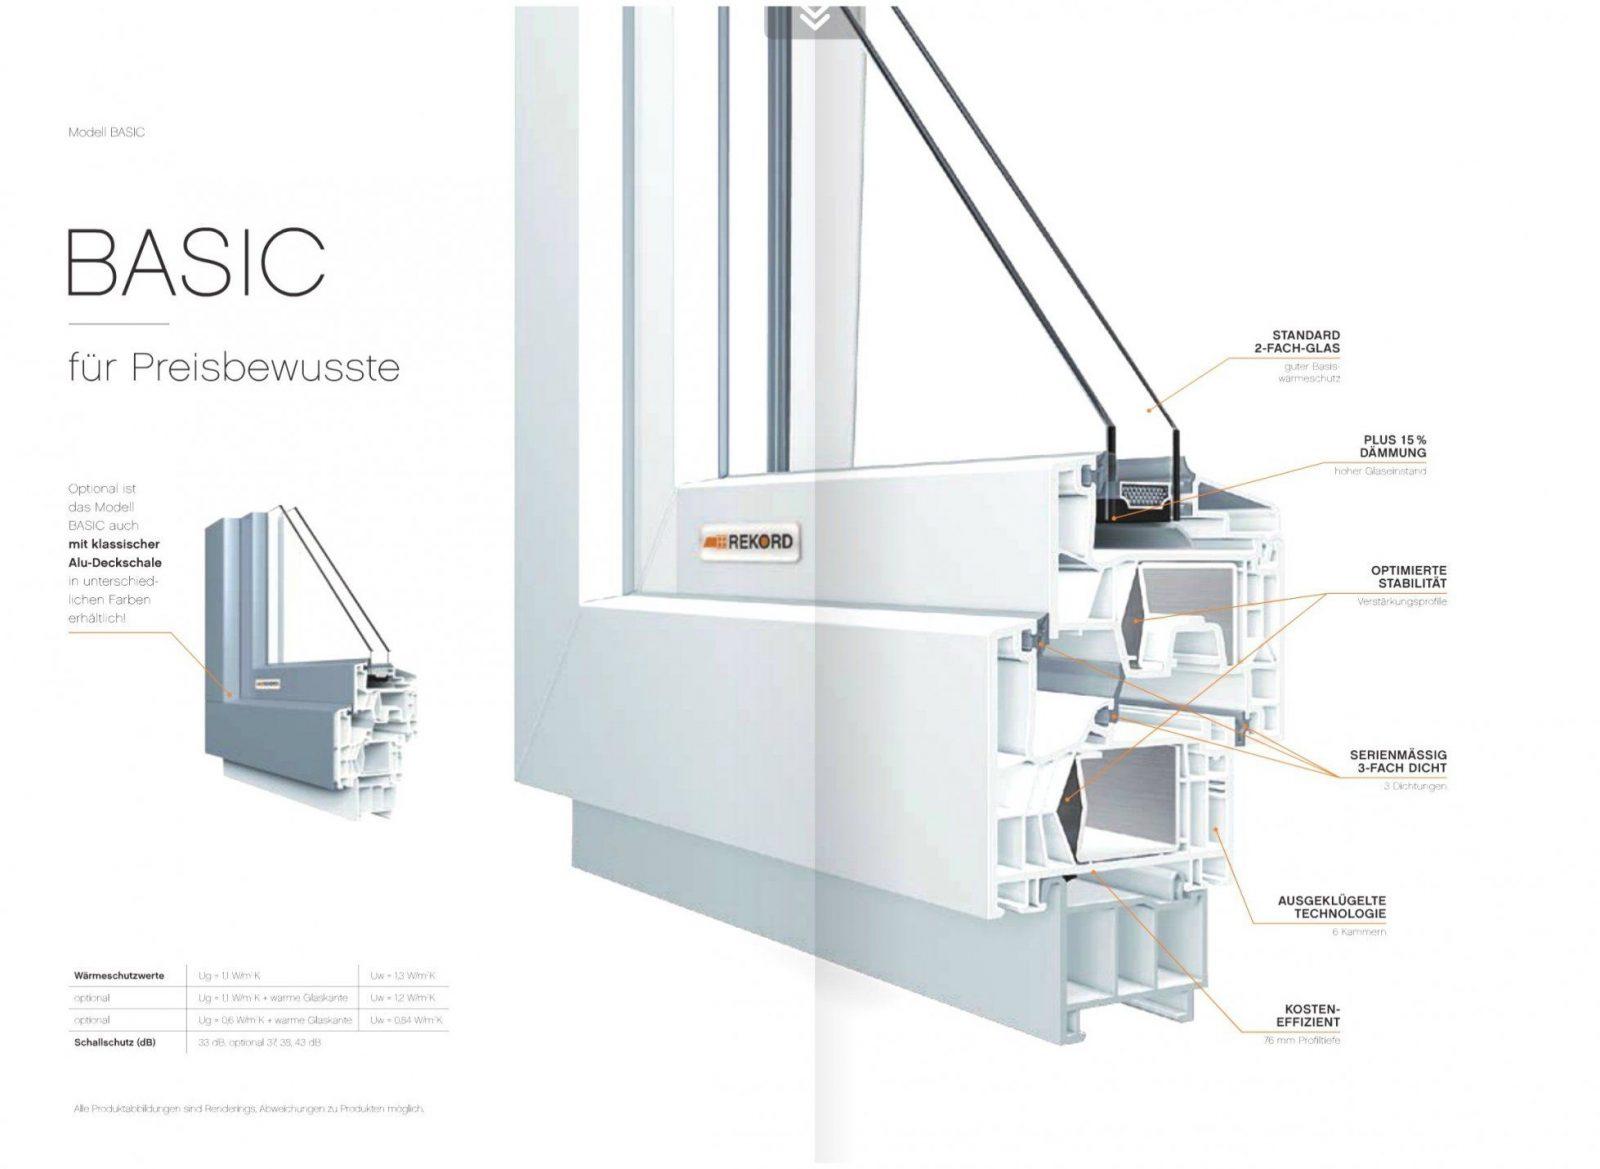 3 fach verglasung kosten haus design ideen. Black Bedroom Furniture Sets. Home Design Ideas